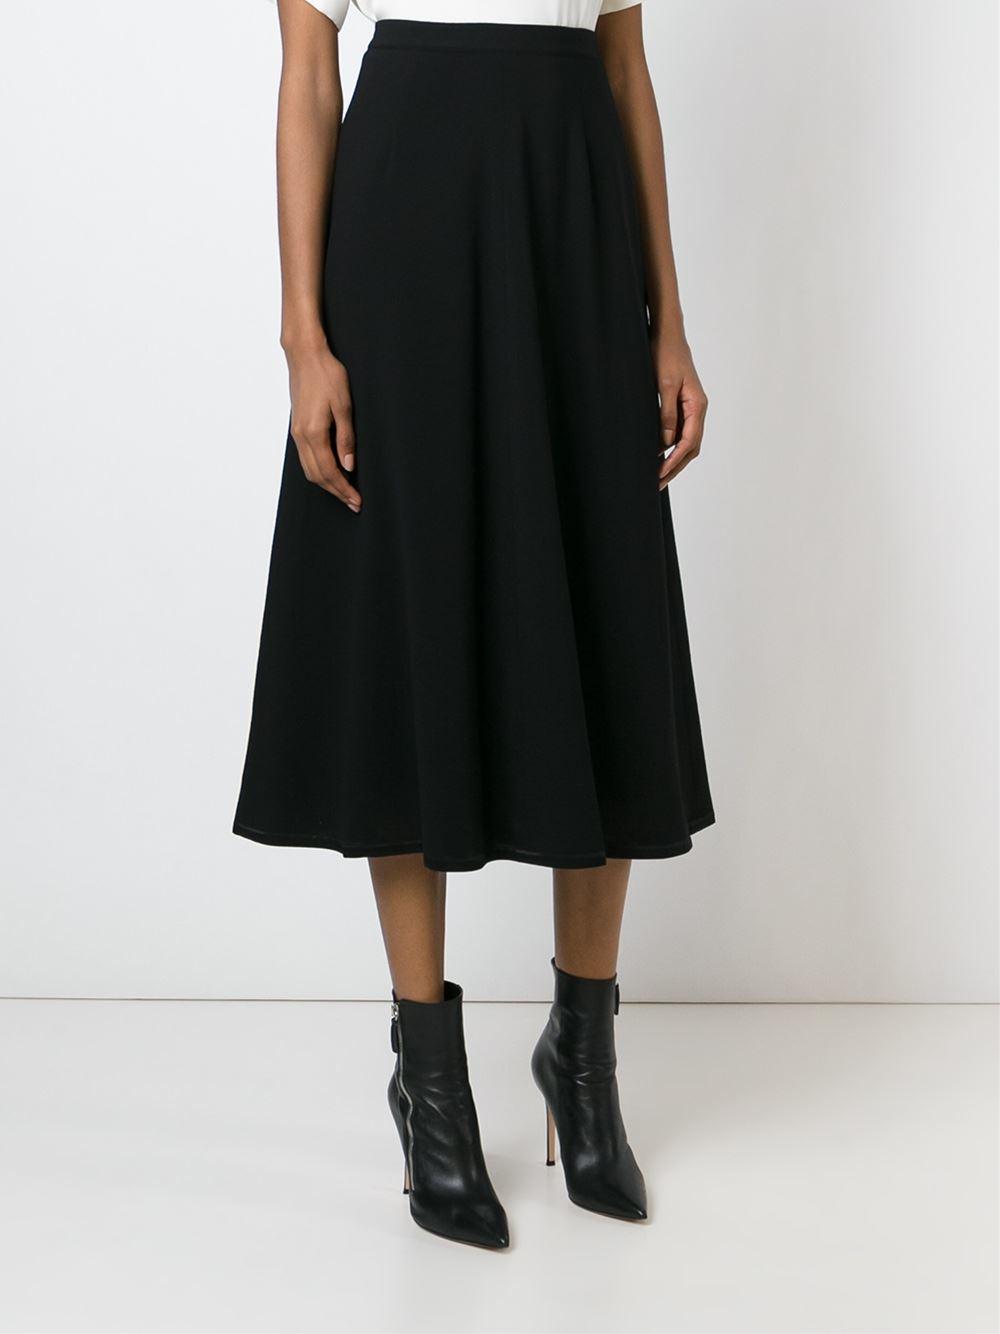 givenchy high waist skirt in black lyst